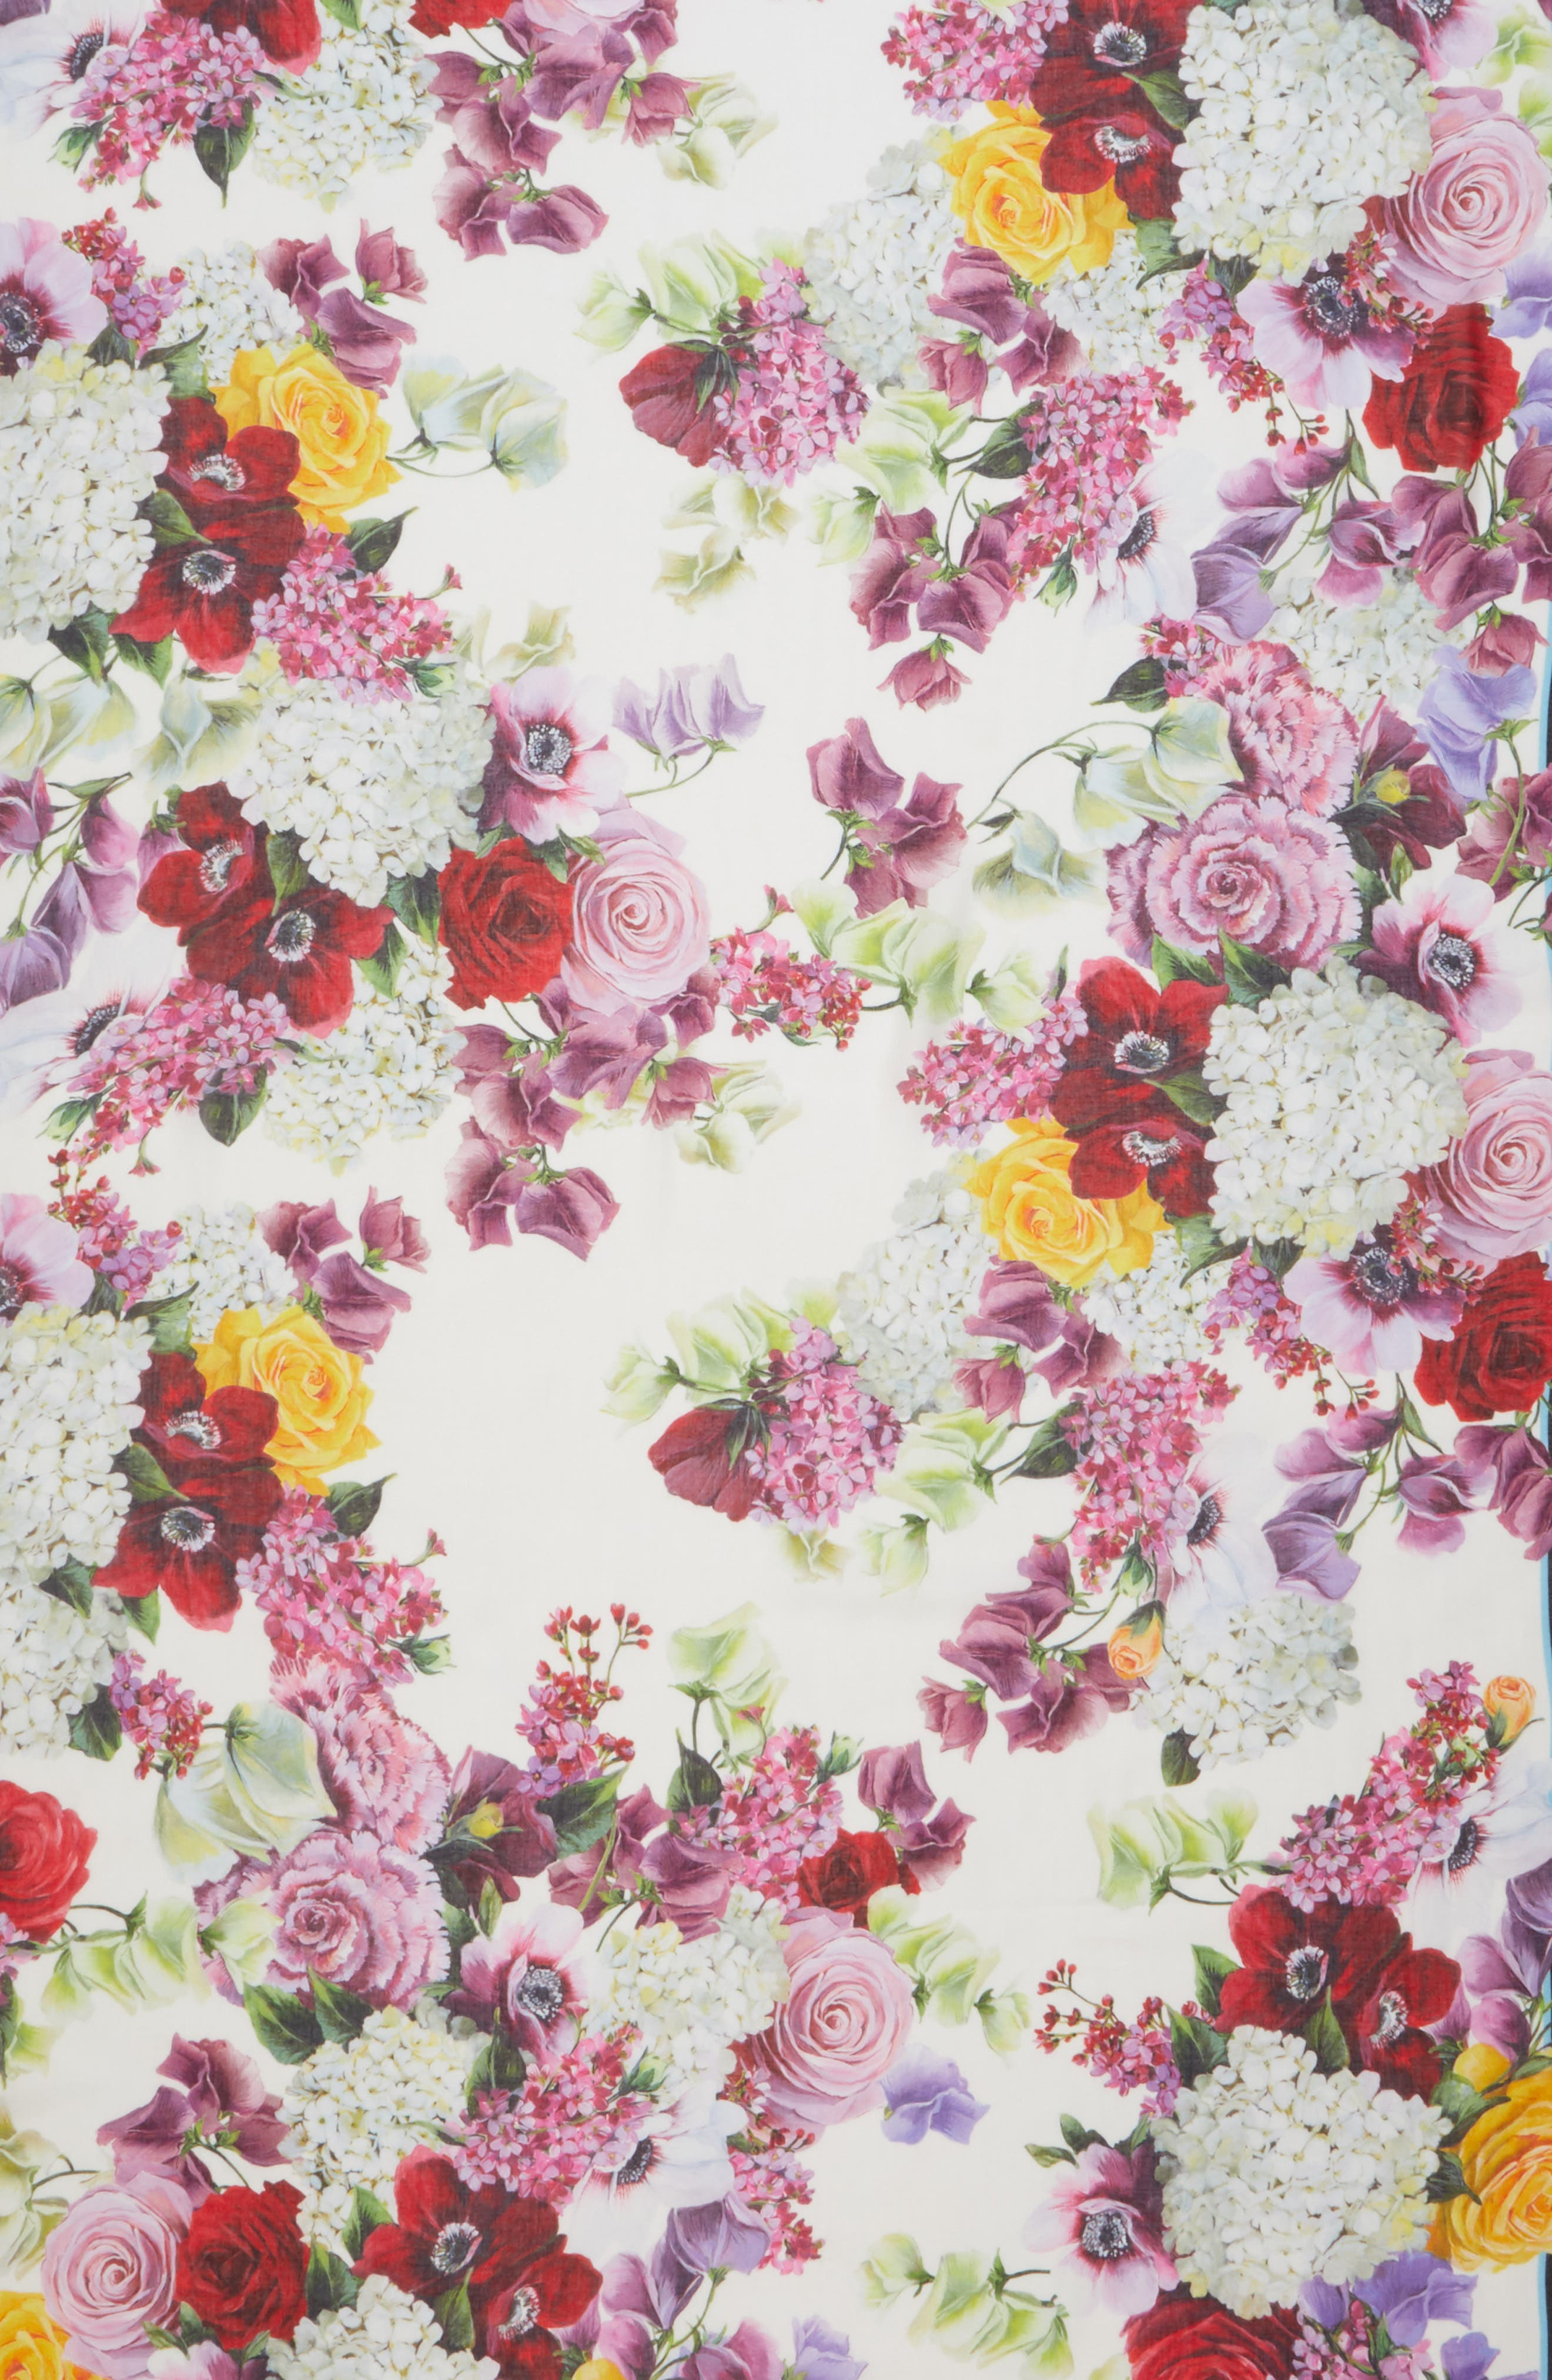 DOLCE&GABBANA, Floral Print Modal & Cashmere Scarf, Alternate thumbnail 4, color, PINK FLORAL